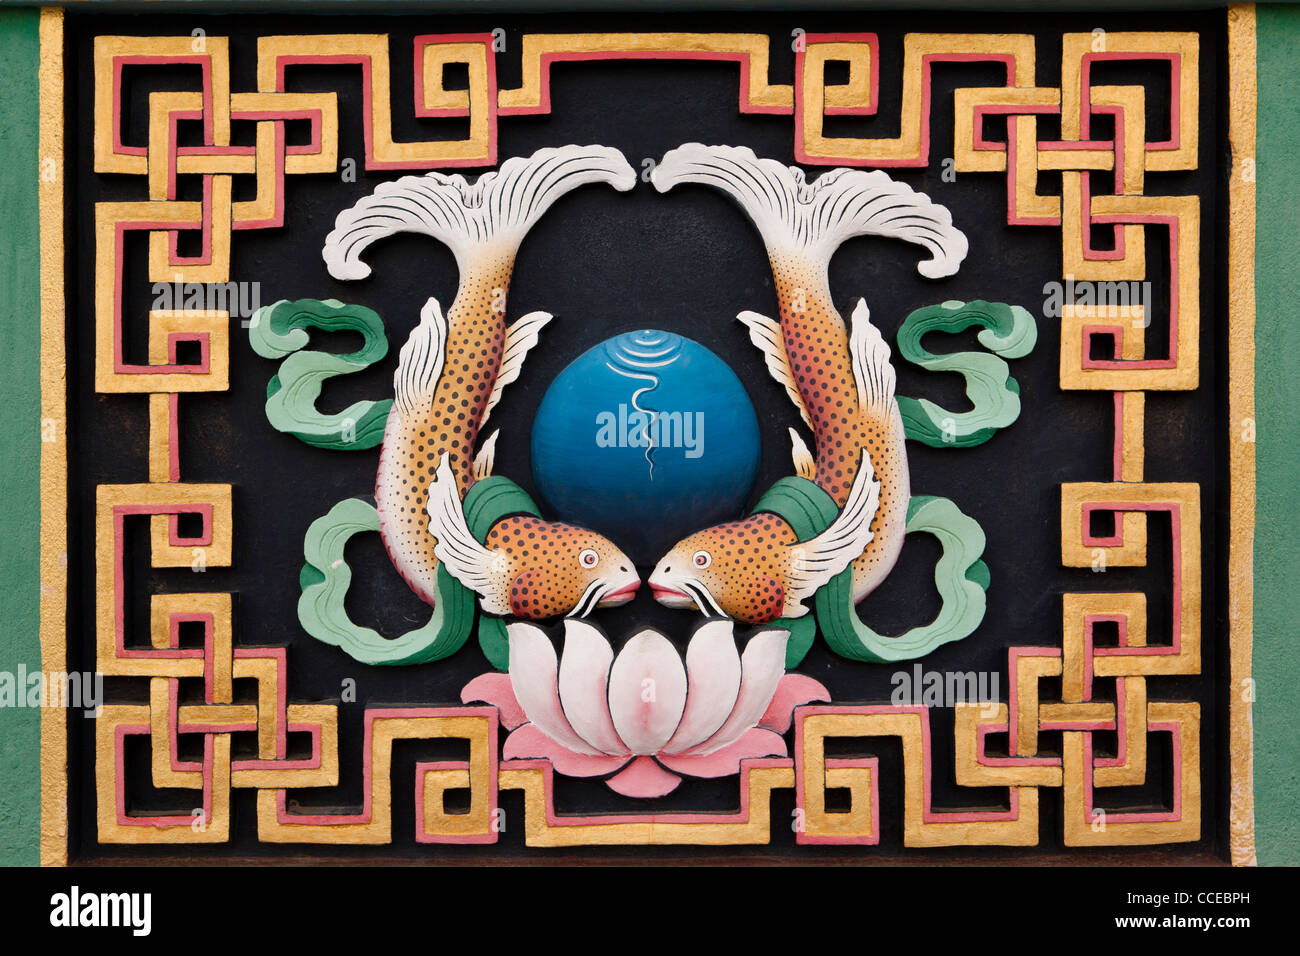 Indien, Arunachal Pradesh, Tawang, Khinmey Nyingma Kloster, Goldene Fische, auspicious Symbol suvarnamatsya Stockbild